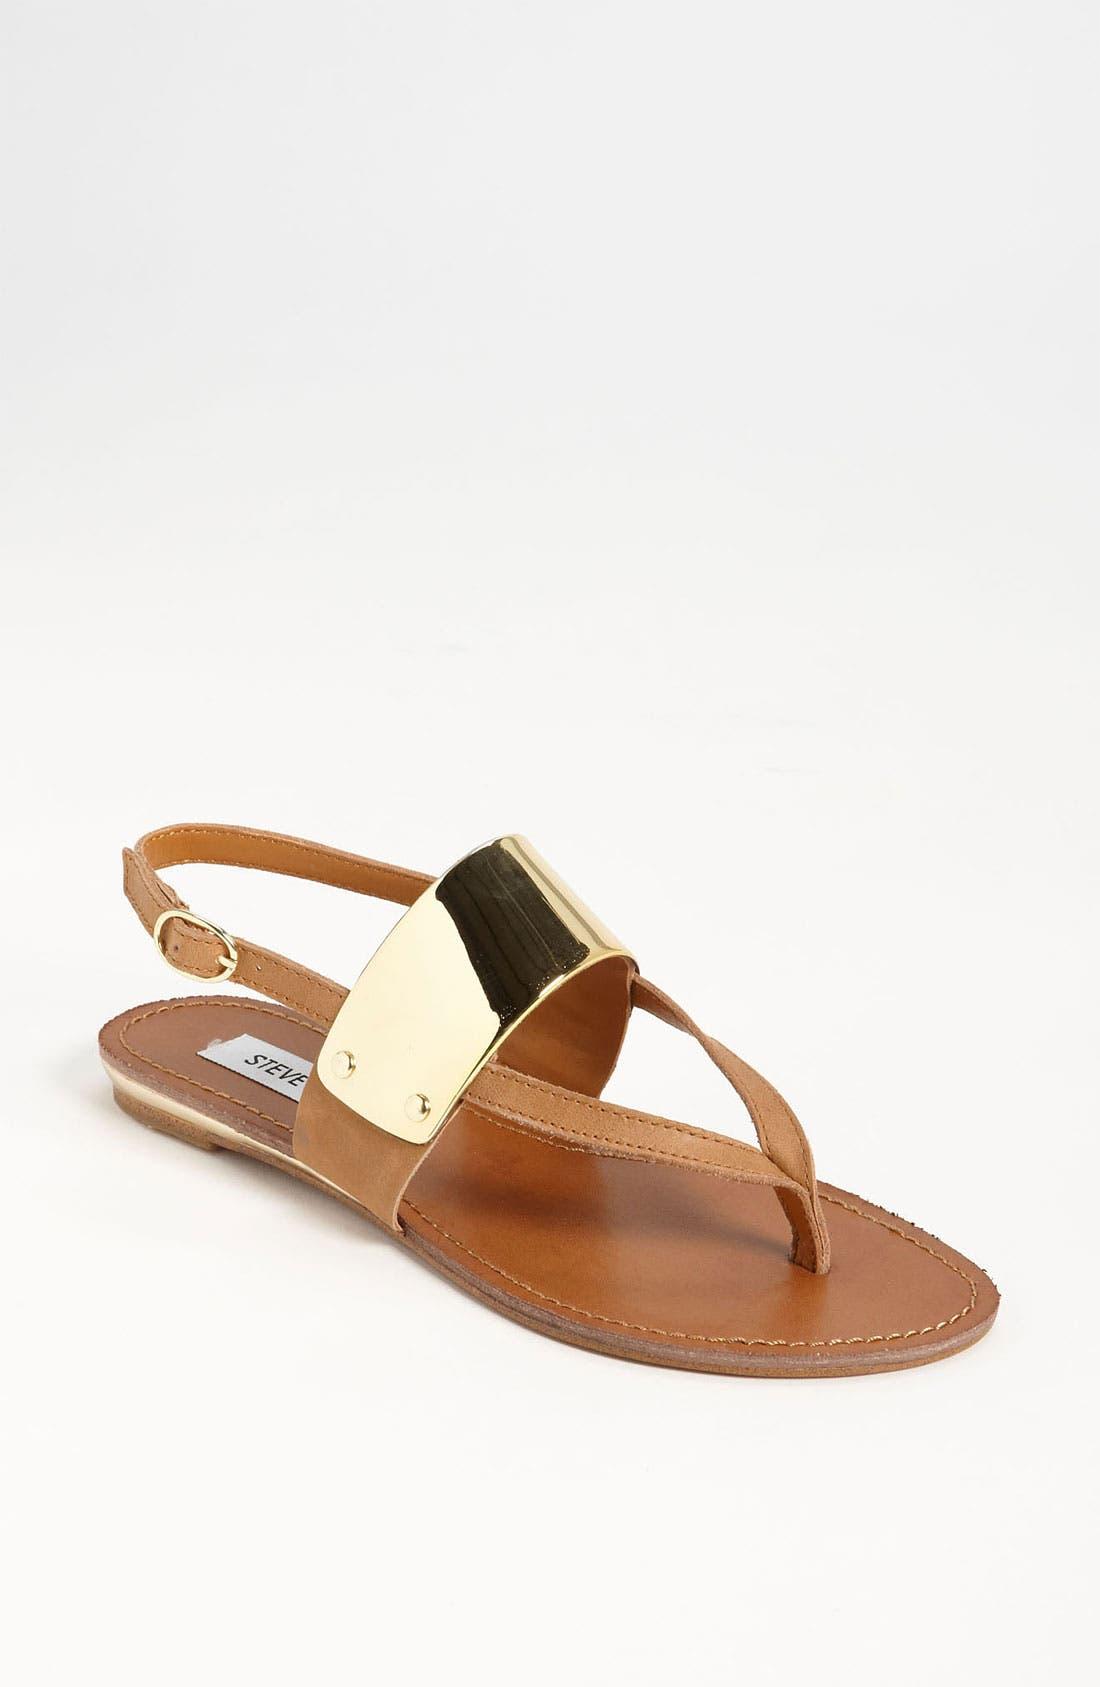 Alternate Image 1 Selected - Steve Madden 'Cufff' Sandal